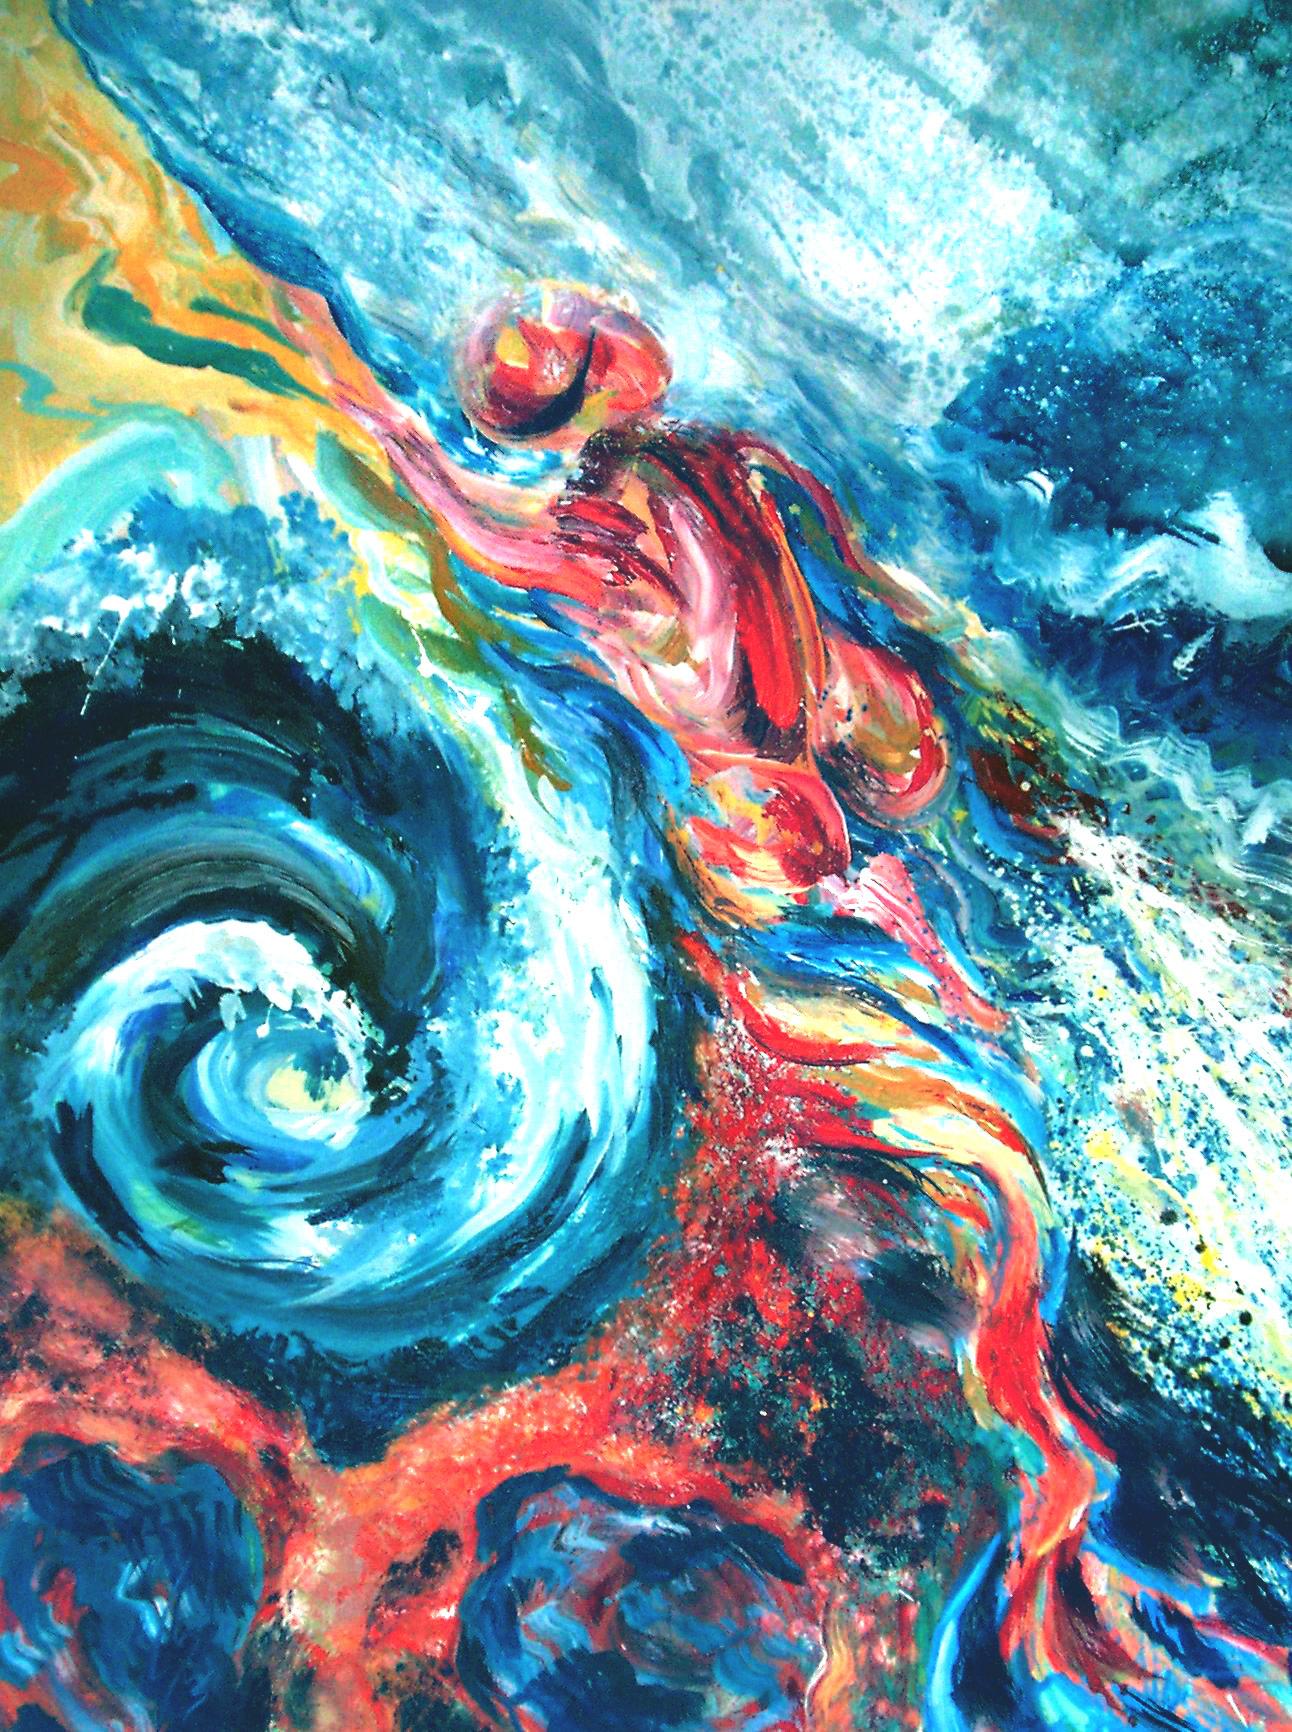 MORNING SWIM - 48 x 36, acrylic on canvas